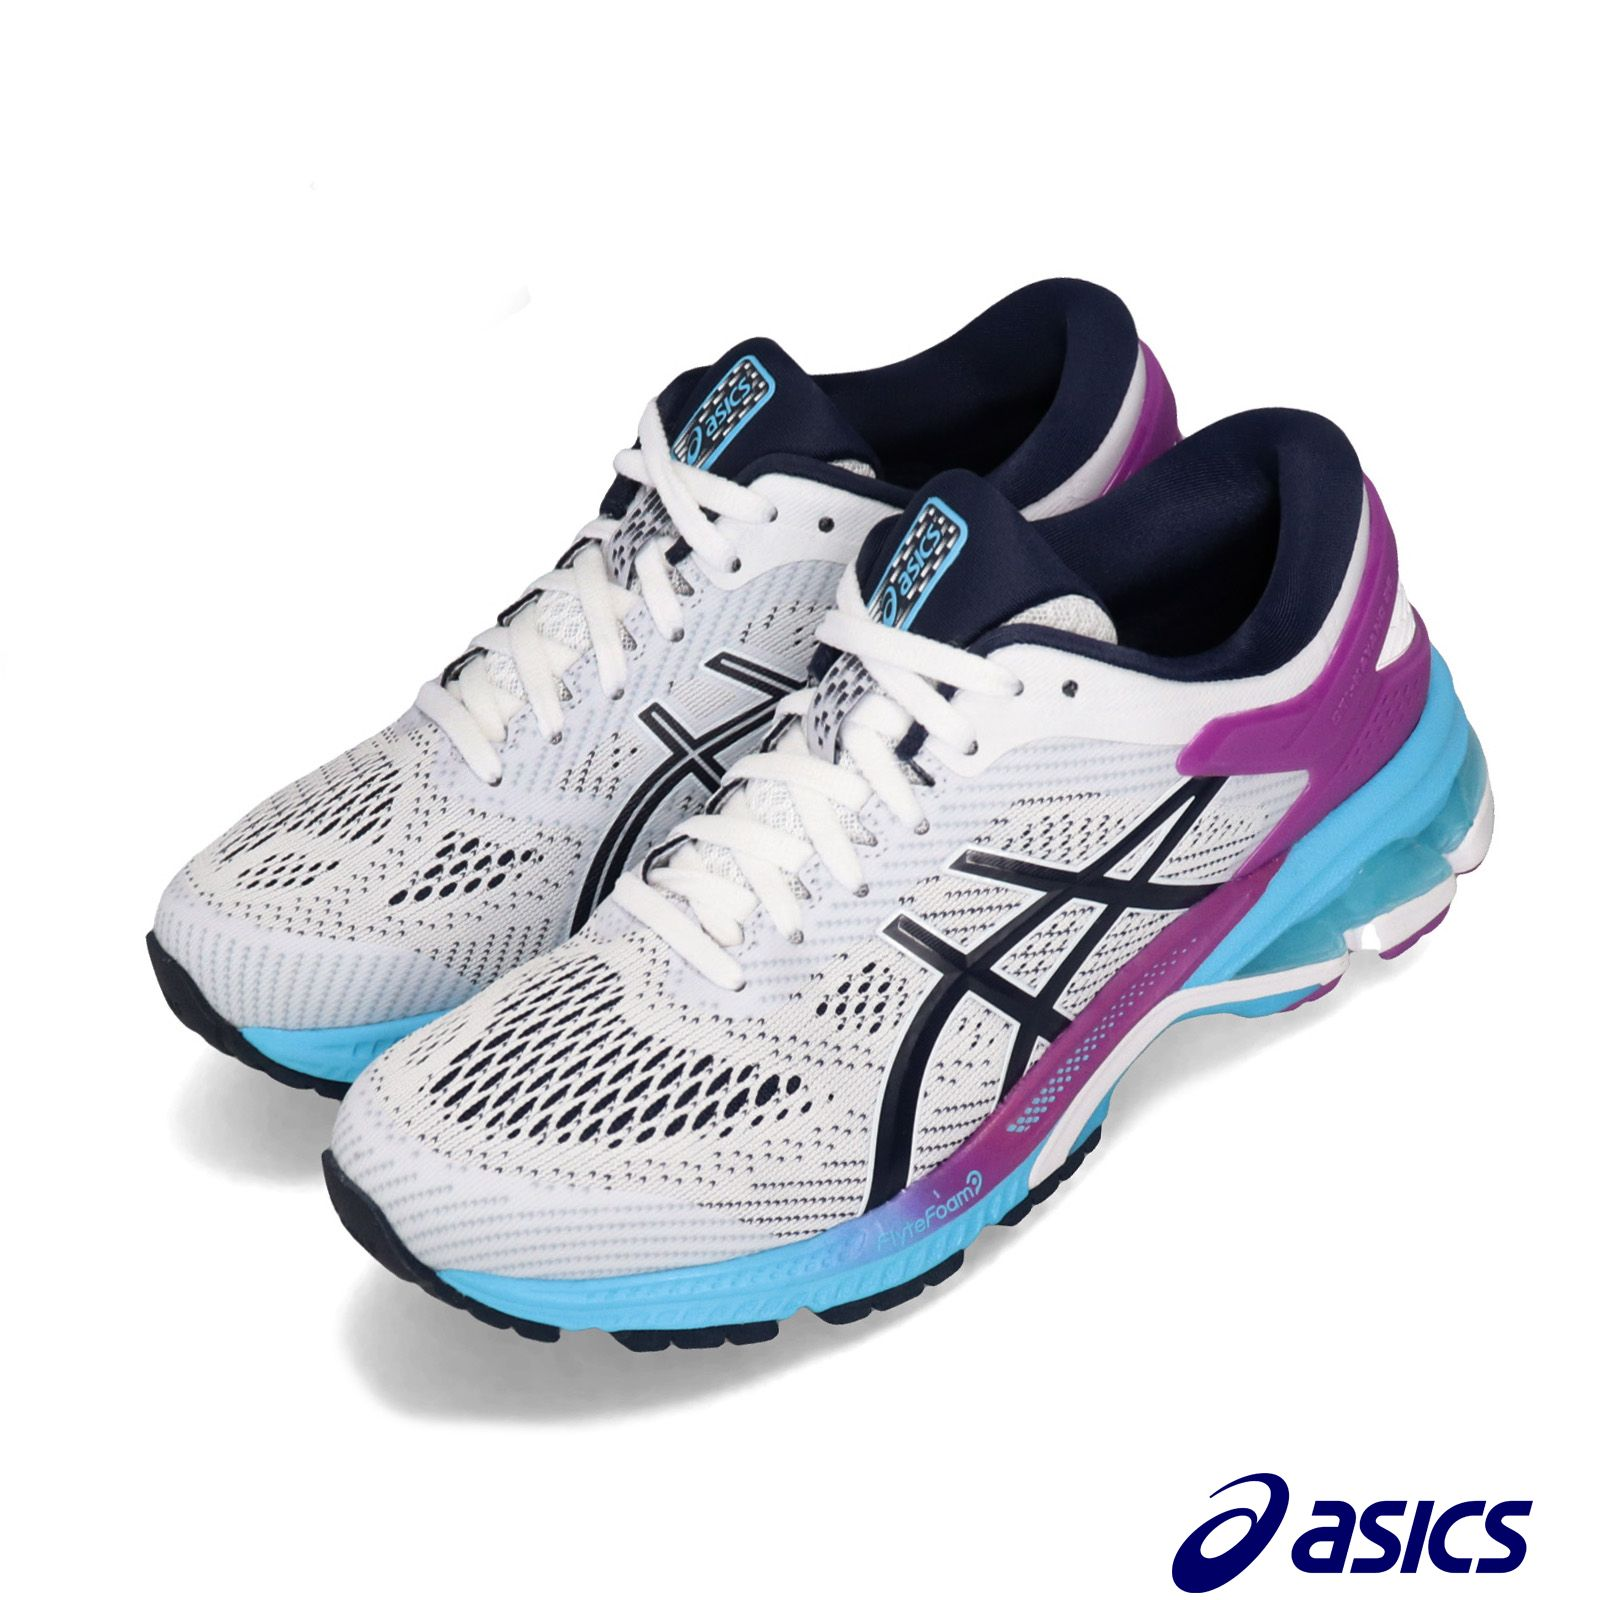 Asics 慢跑鞋 Gel-Kayano 26 運動 女鞋 1012A457100